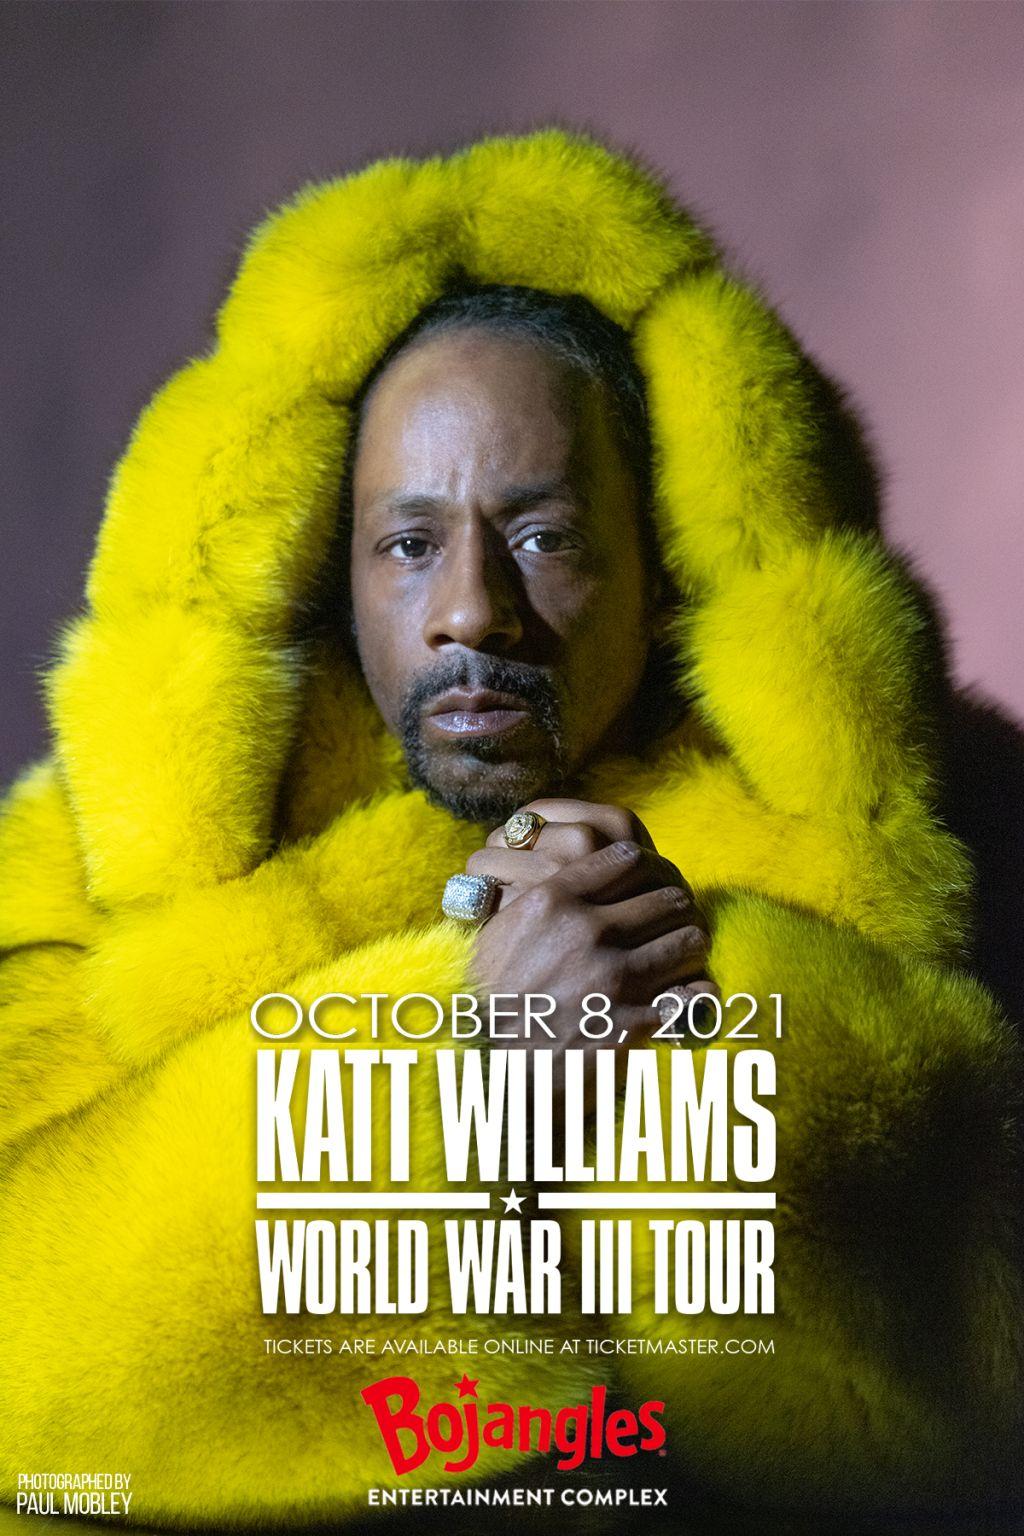 Katt Williams in Charlotte